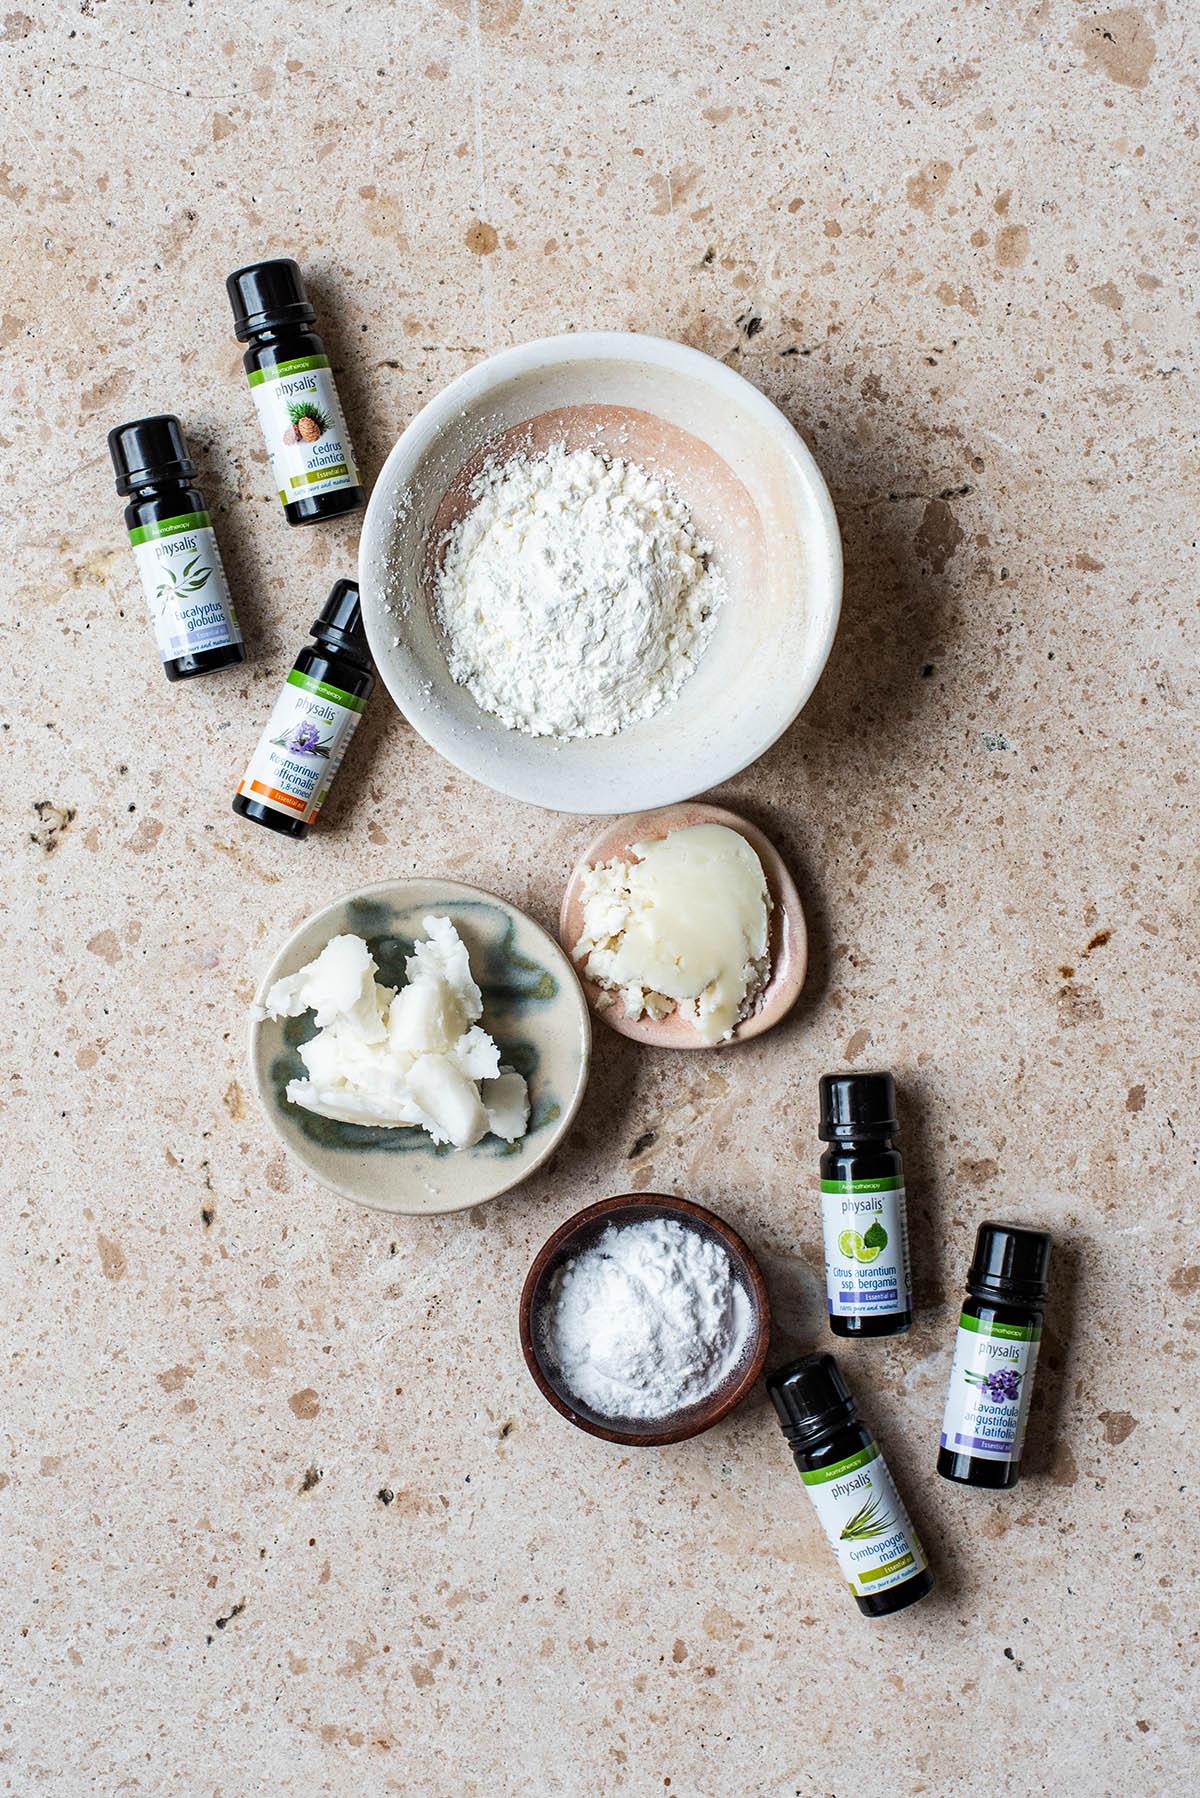 Homemade Deodorant for Sensitive Skin ingredients.